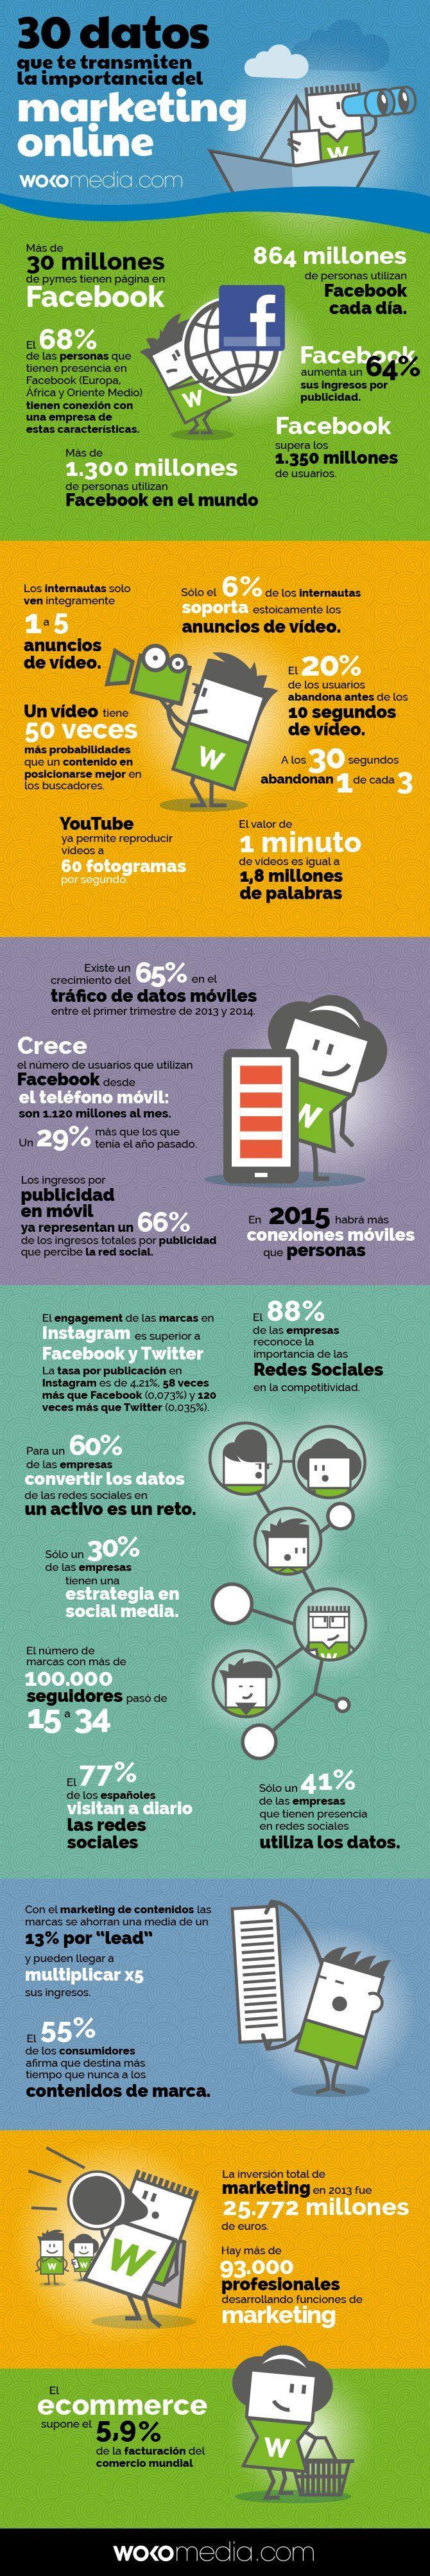 30 datos sobre la importancia del marketing online #infografia #infographic #marketing